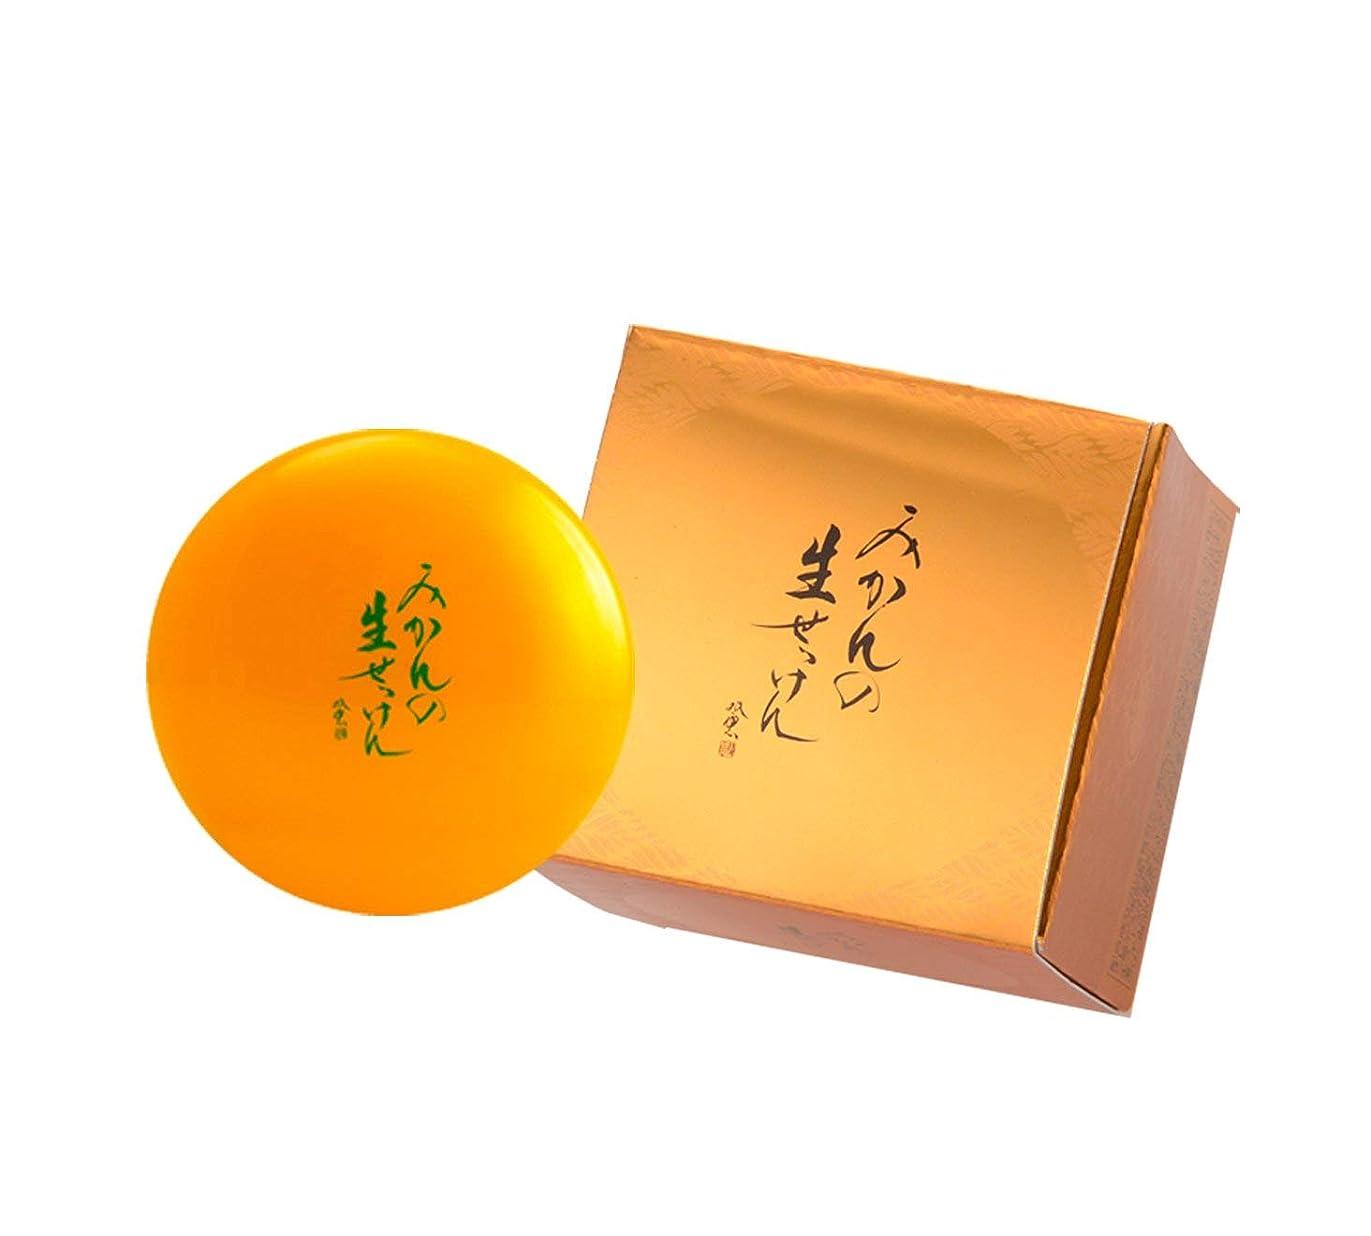 UYEKI美香柑みかんの生せっけん120g×3個セット